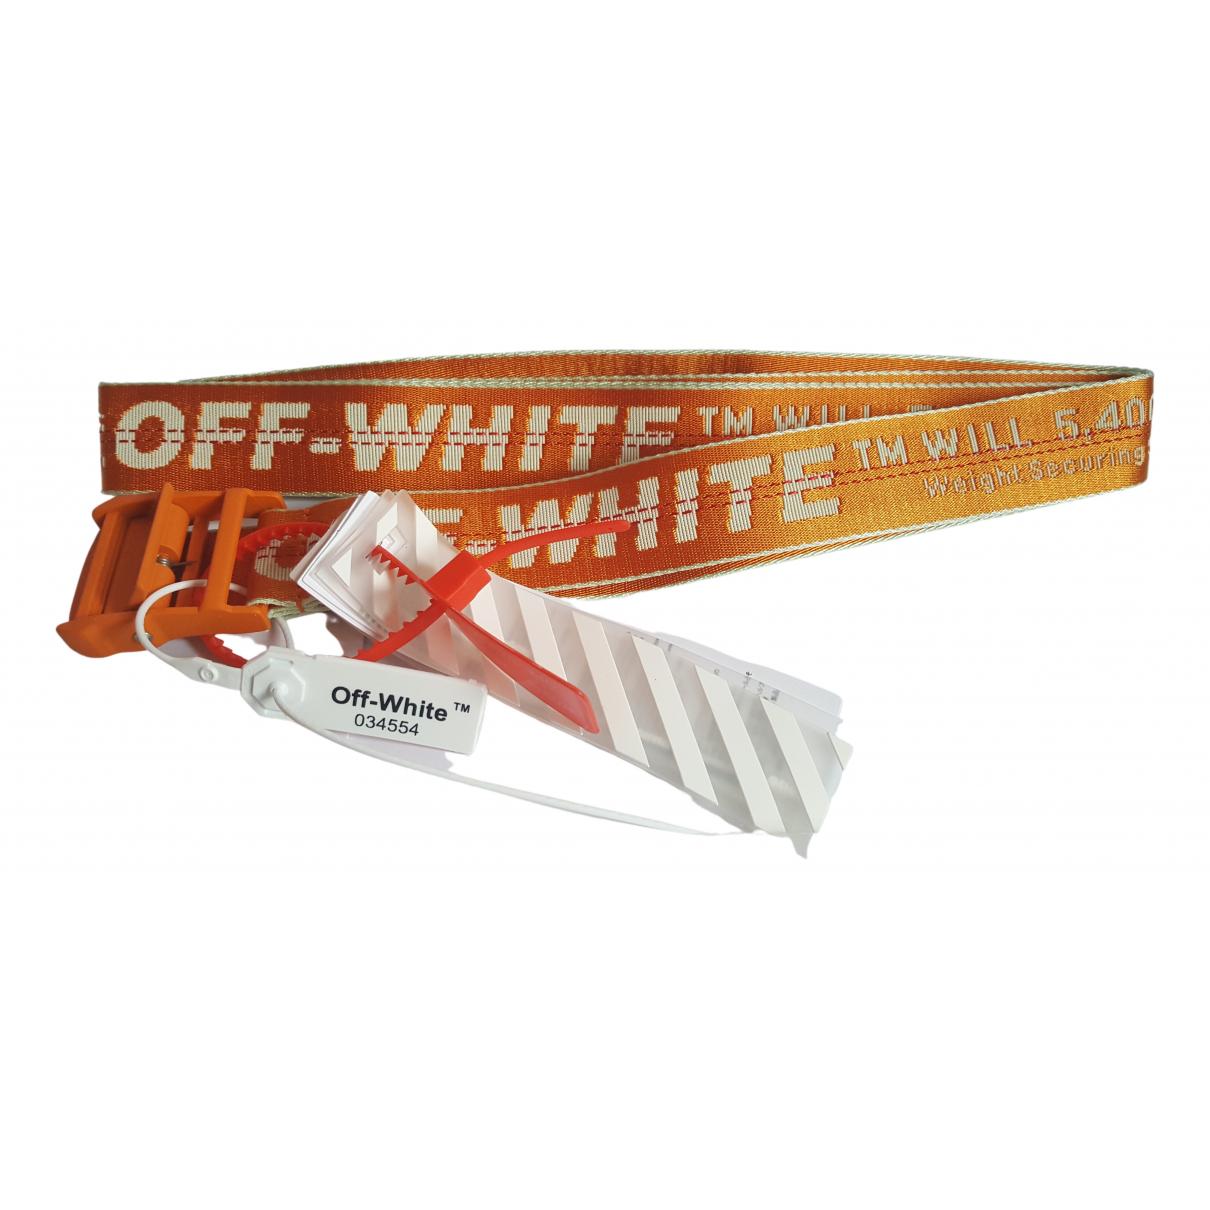 Cinturon Off-white